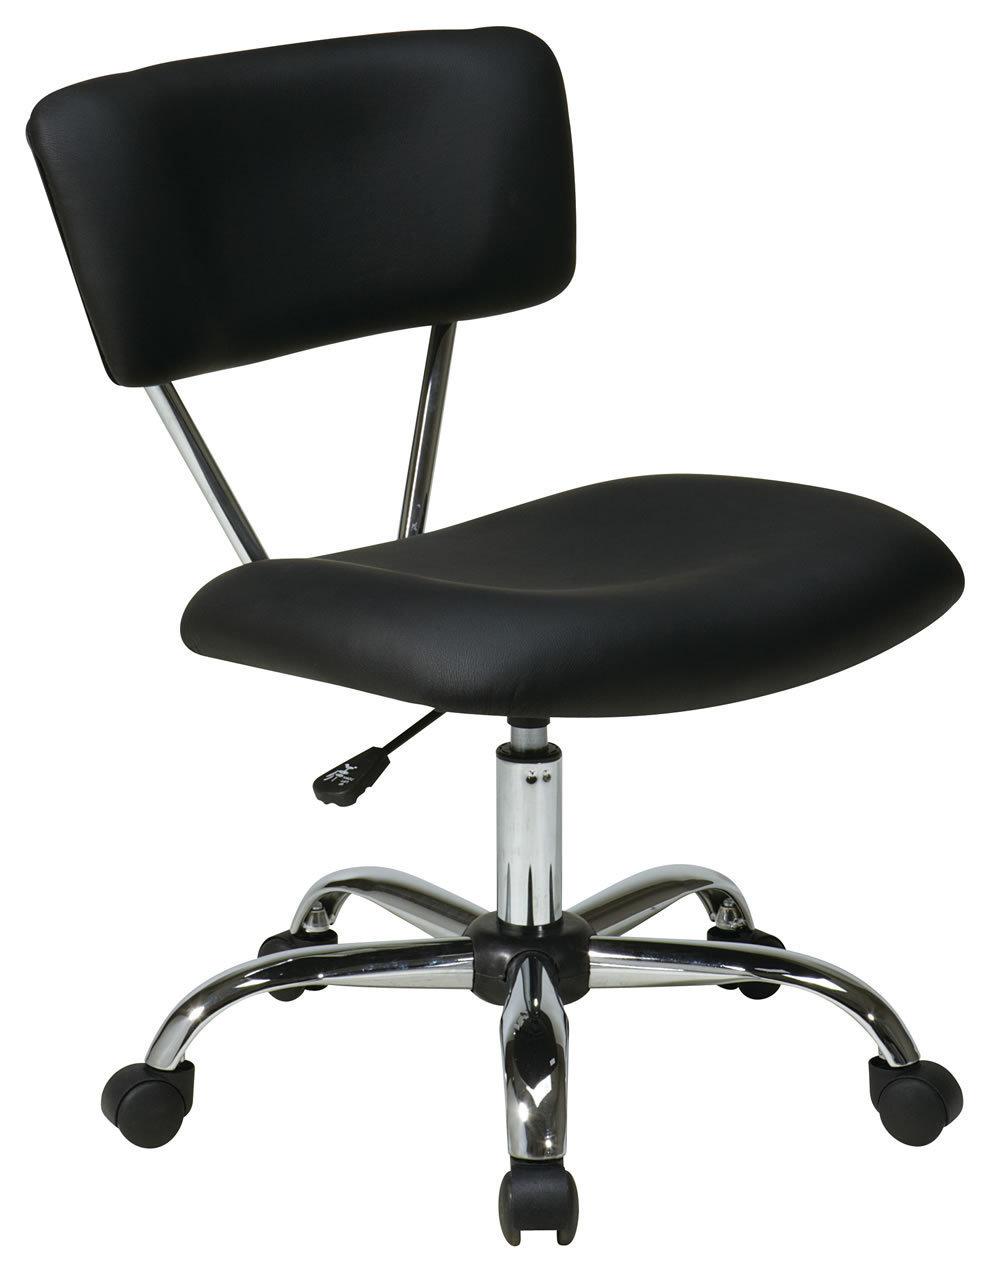 Vista Task Chair - BLACK Accent Desk Swivel Office Chair W/Chrome Frame